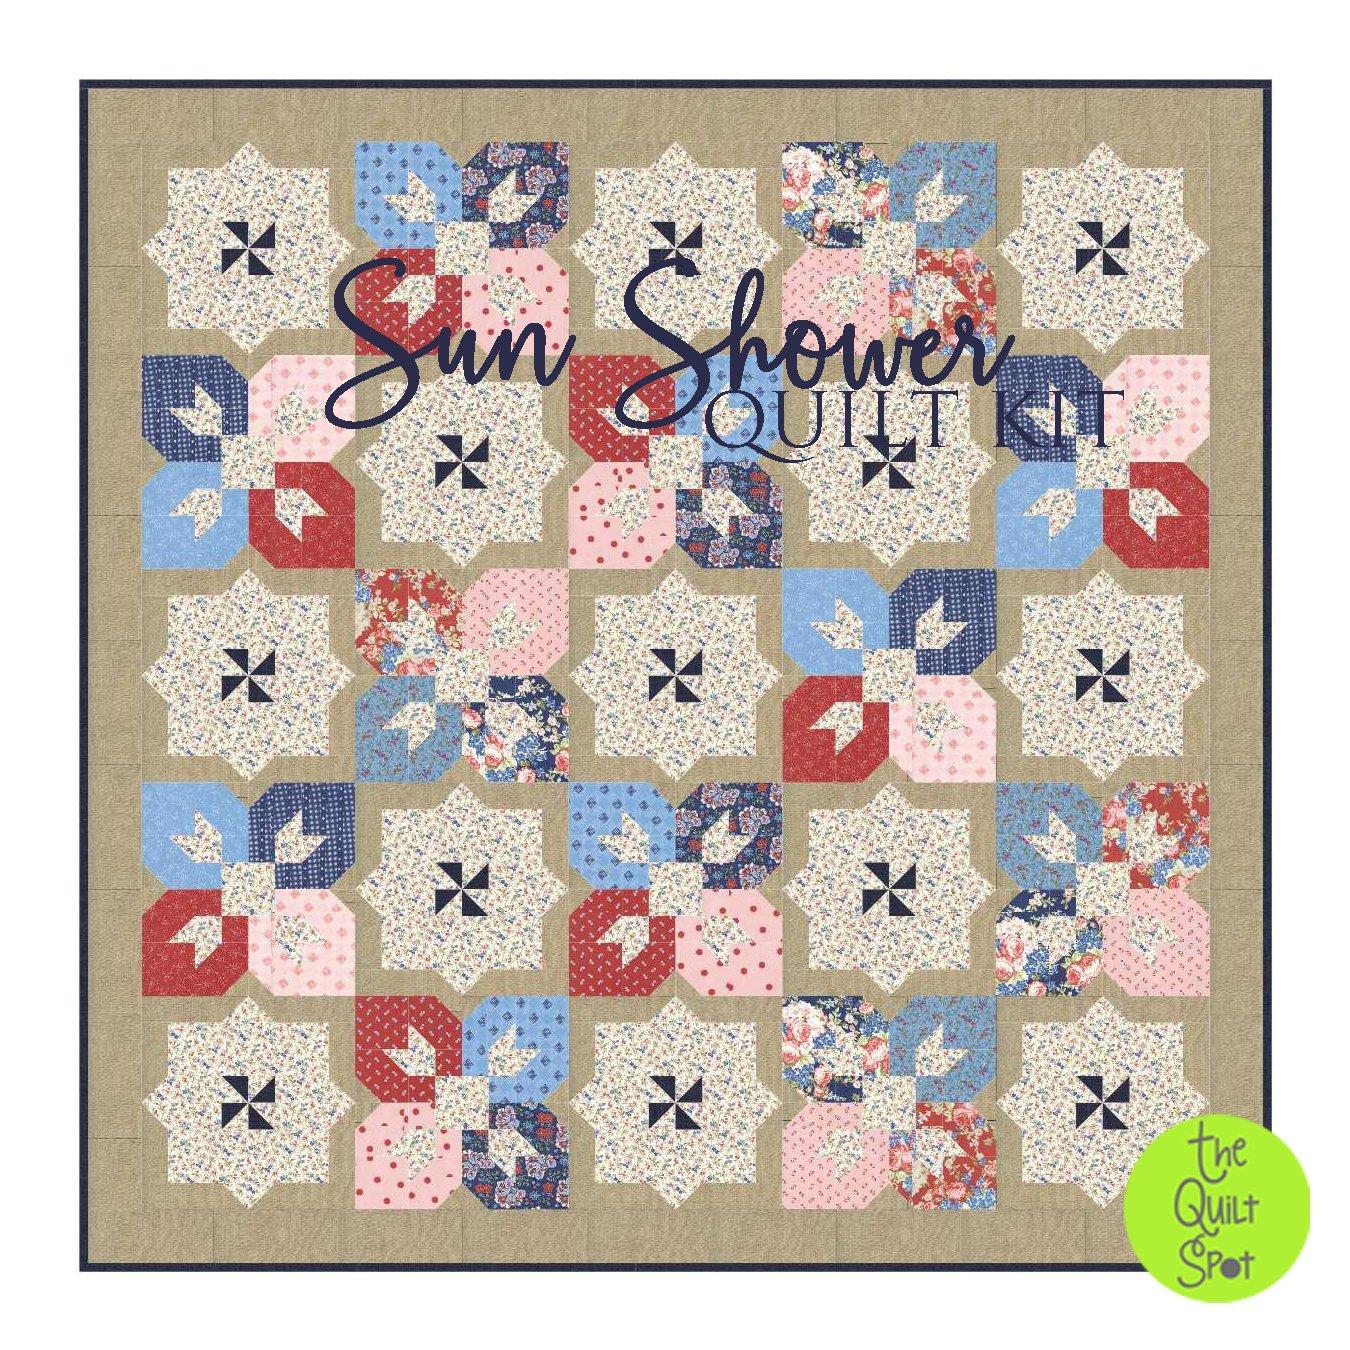 Sun Shower Quilt Kit featuring Mackinac Island Fabrics by Minick & Simpson